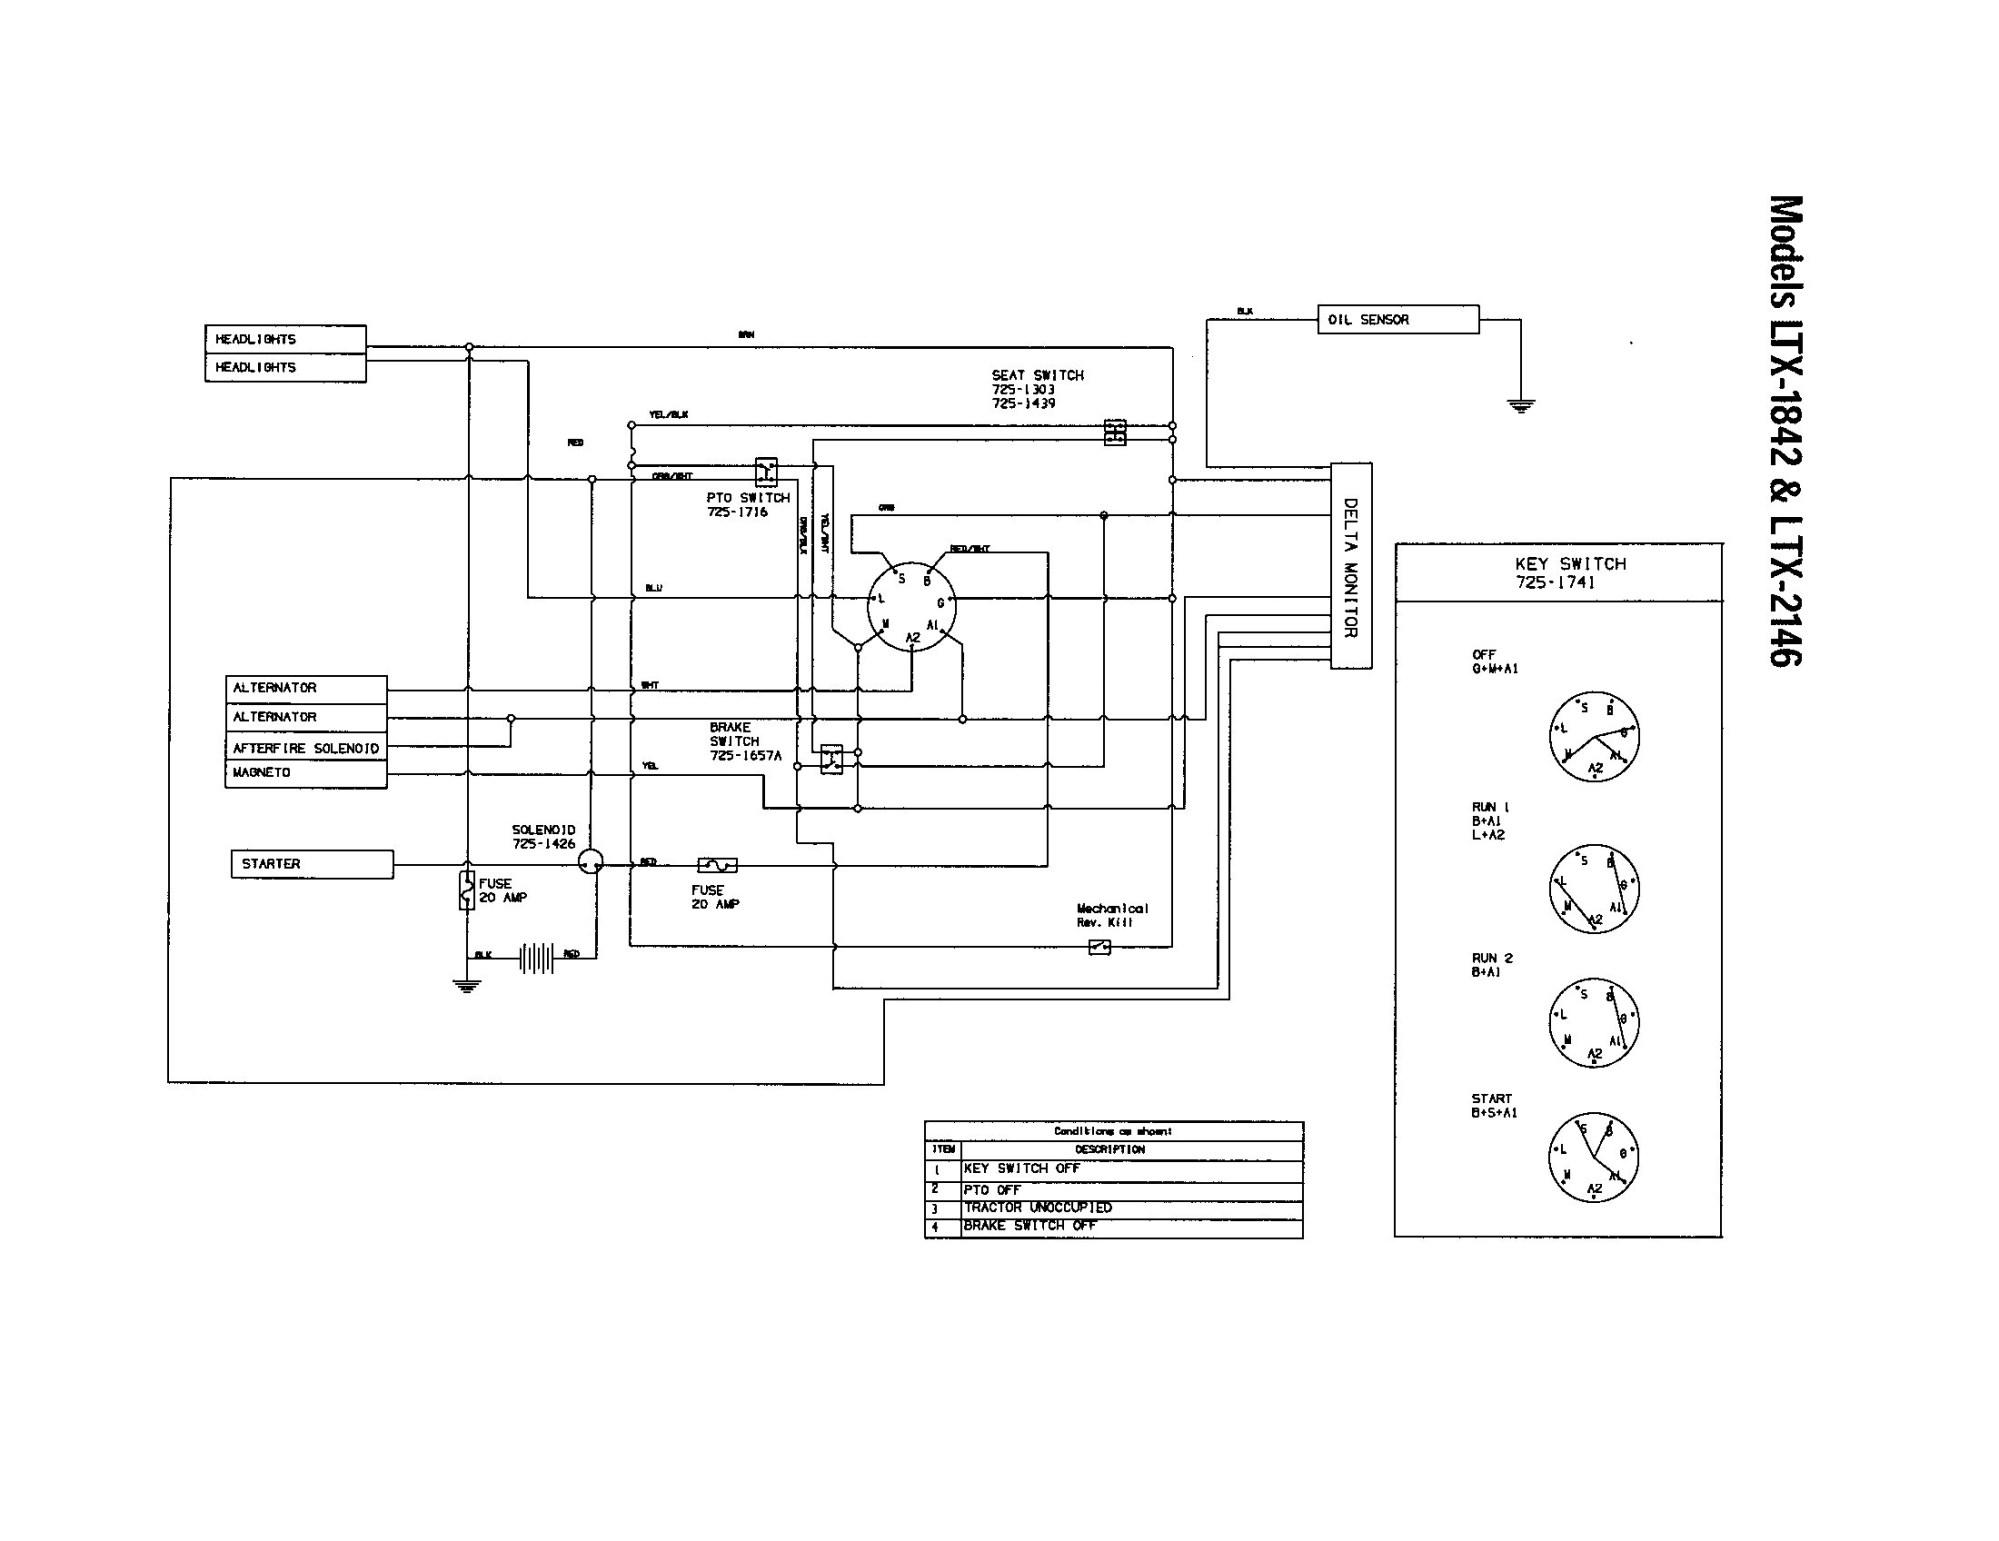 hight resolution of craftsman pto switch wiring diagram free wiring diagram rh ricardolevinsmorales com craftsman 42 mower wiring diagram craftsman 42 inch riding mower wiring